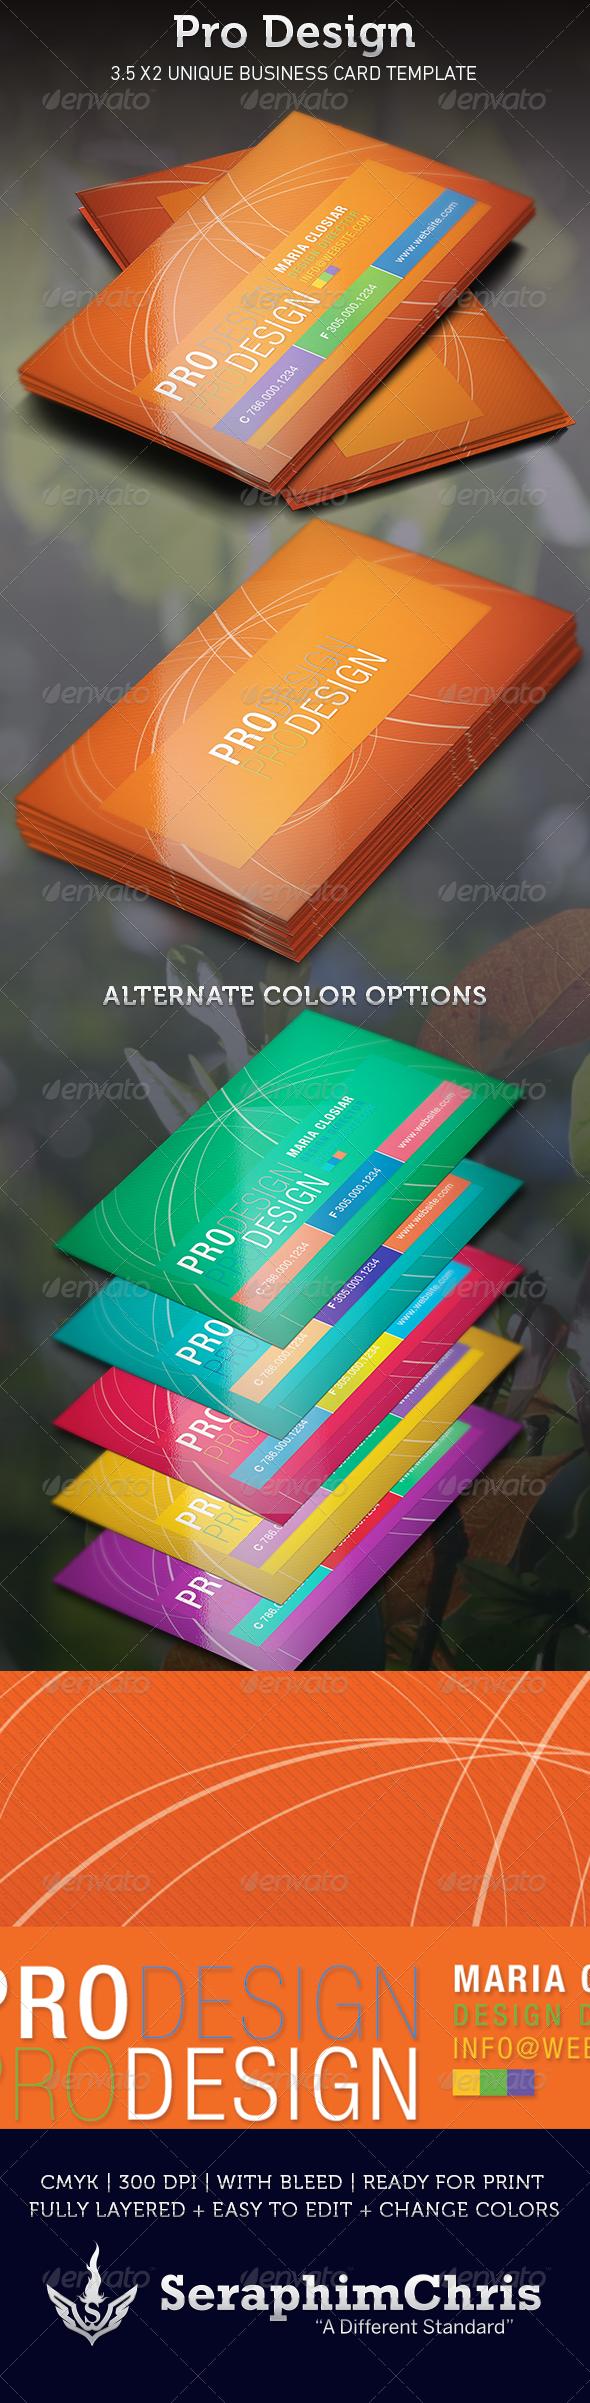 Pro Design Business Card Template  - Creative Business Cards